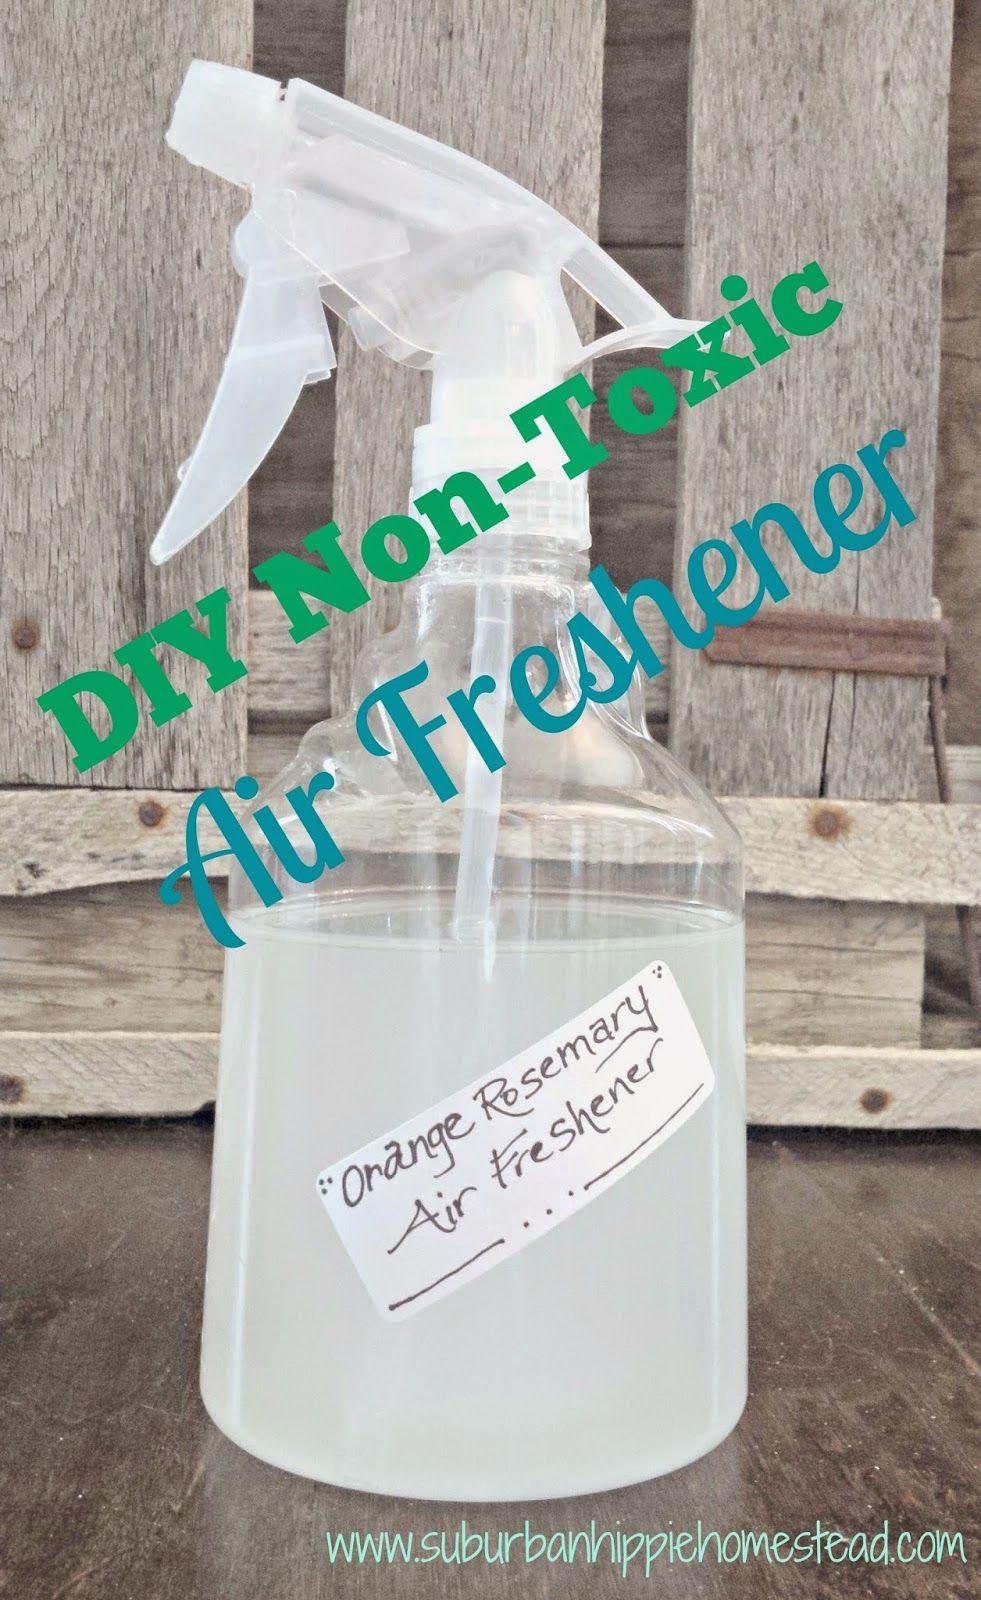 DIY NonToxic Air Freshener Air freshener, Freshener, Diy